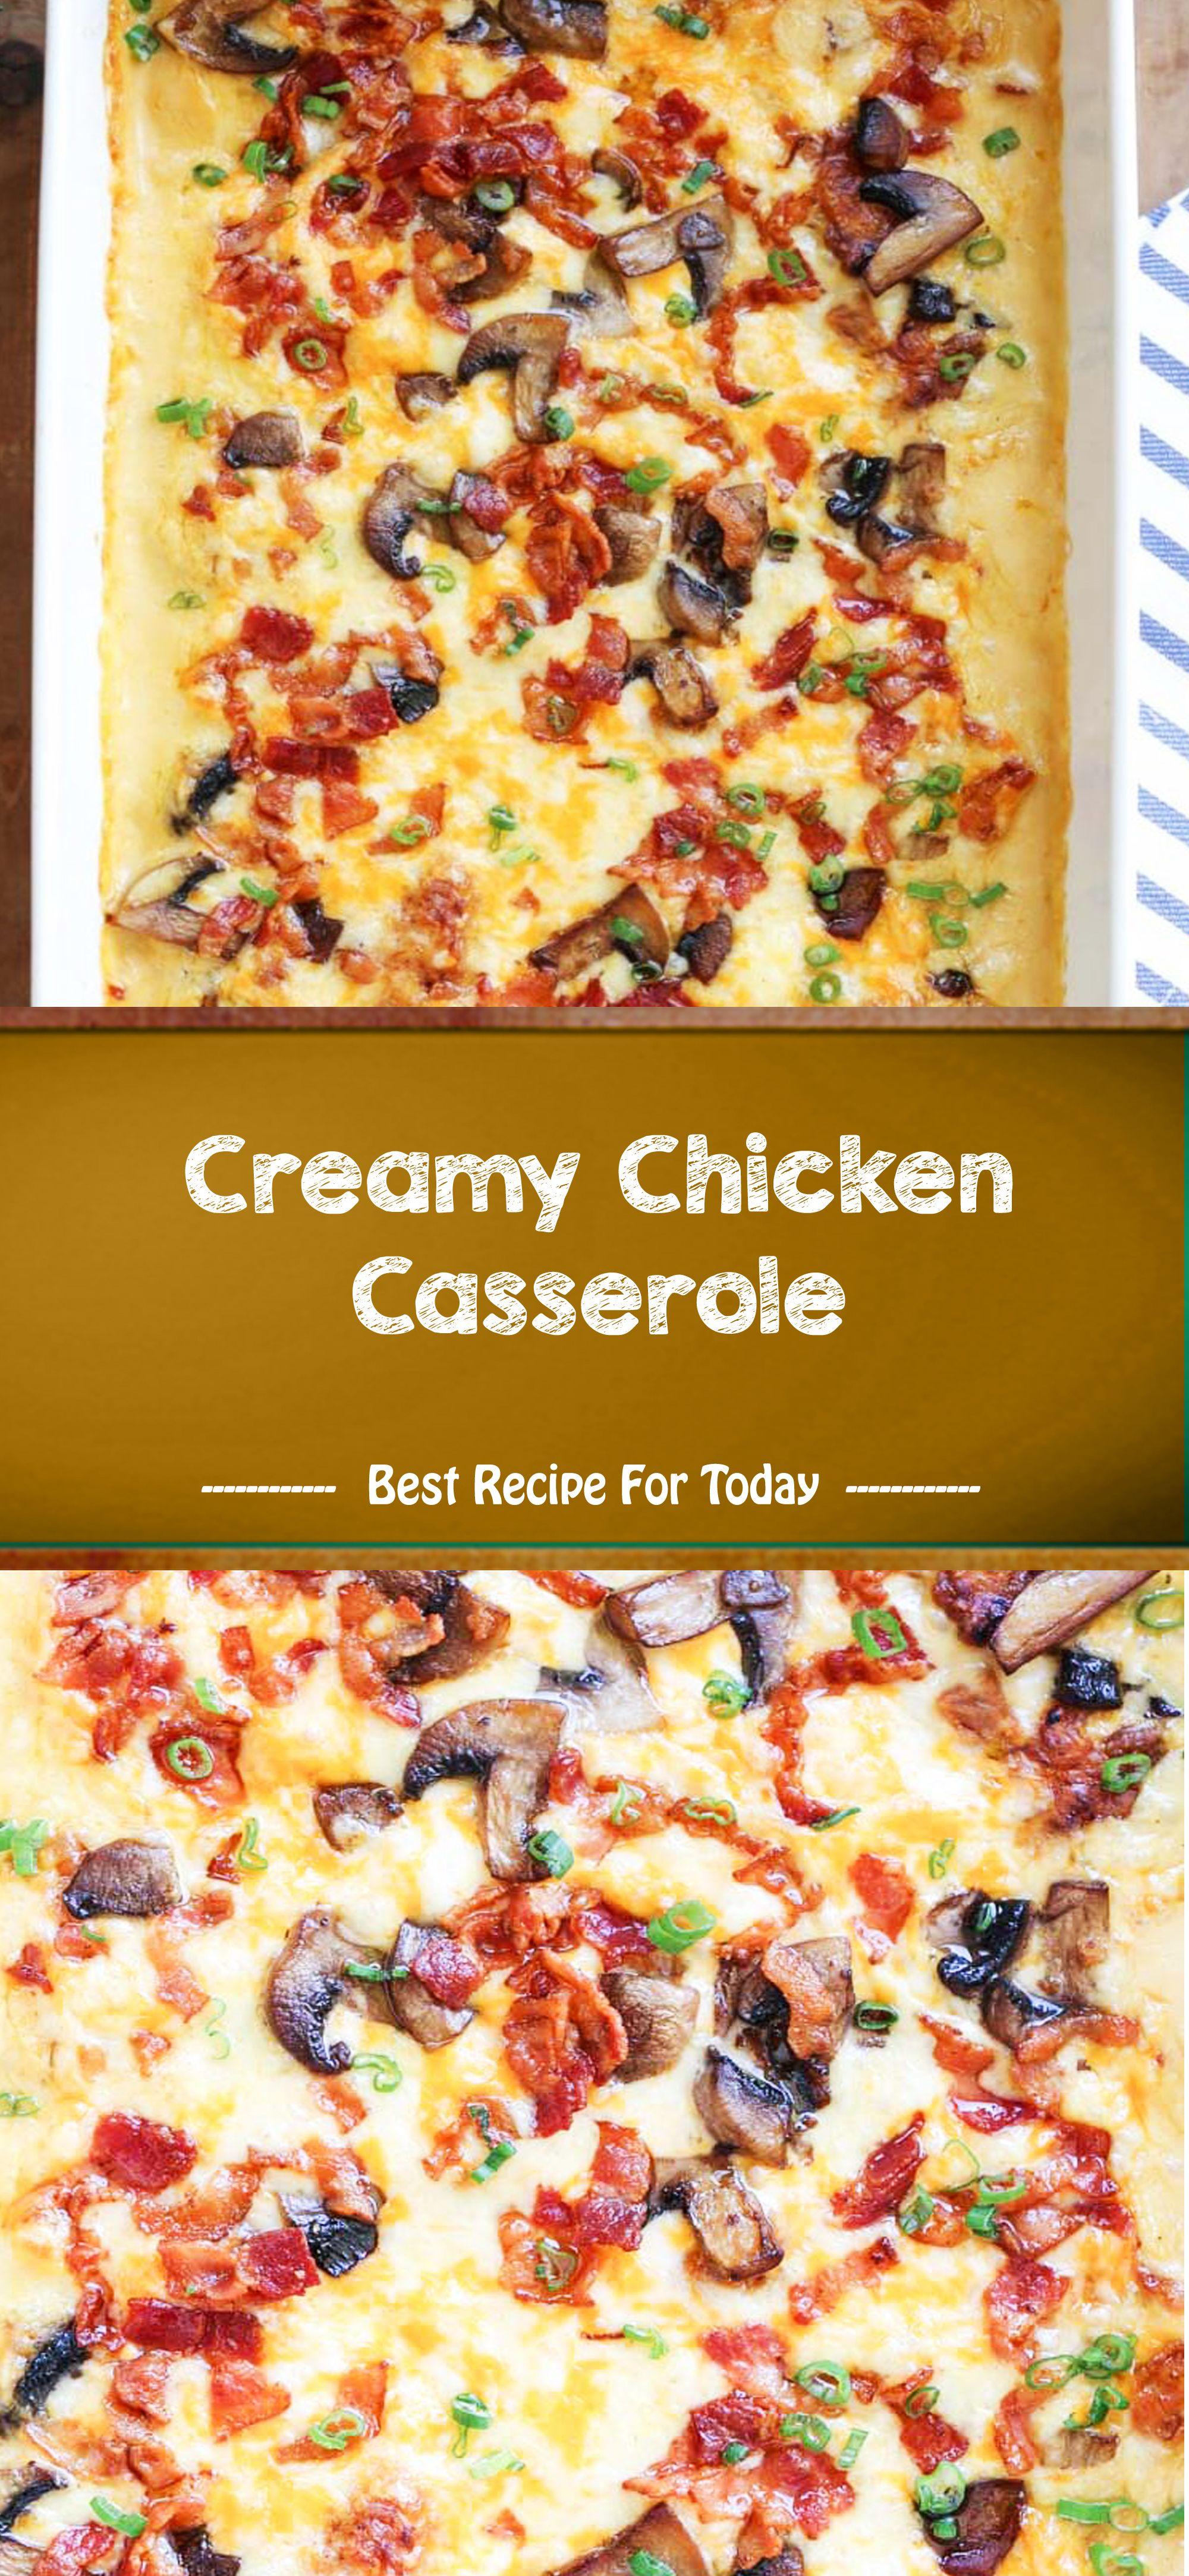 Creamy Chicken Casserole #creamychickencasserole